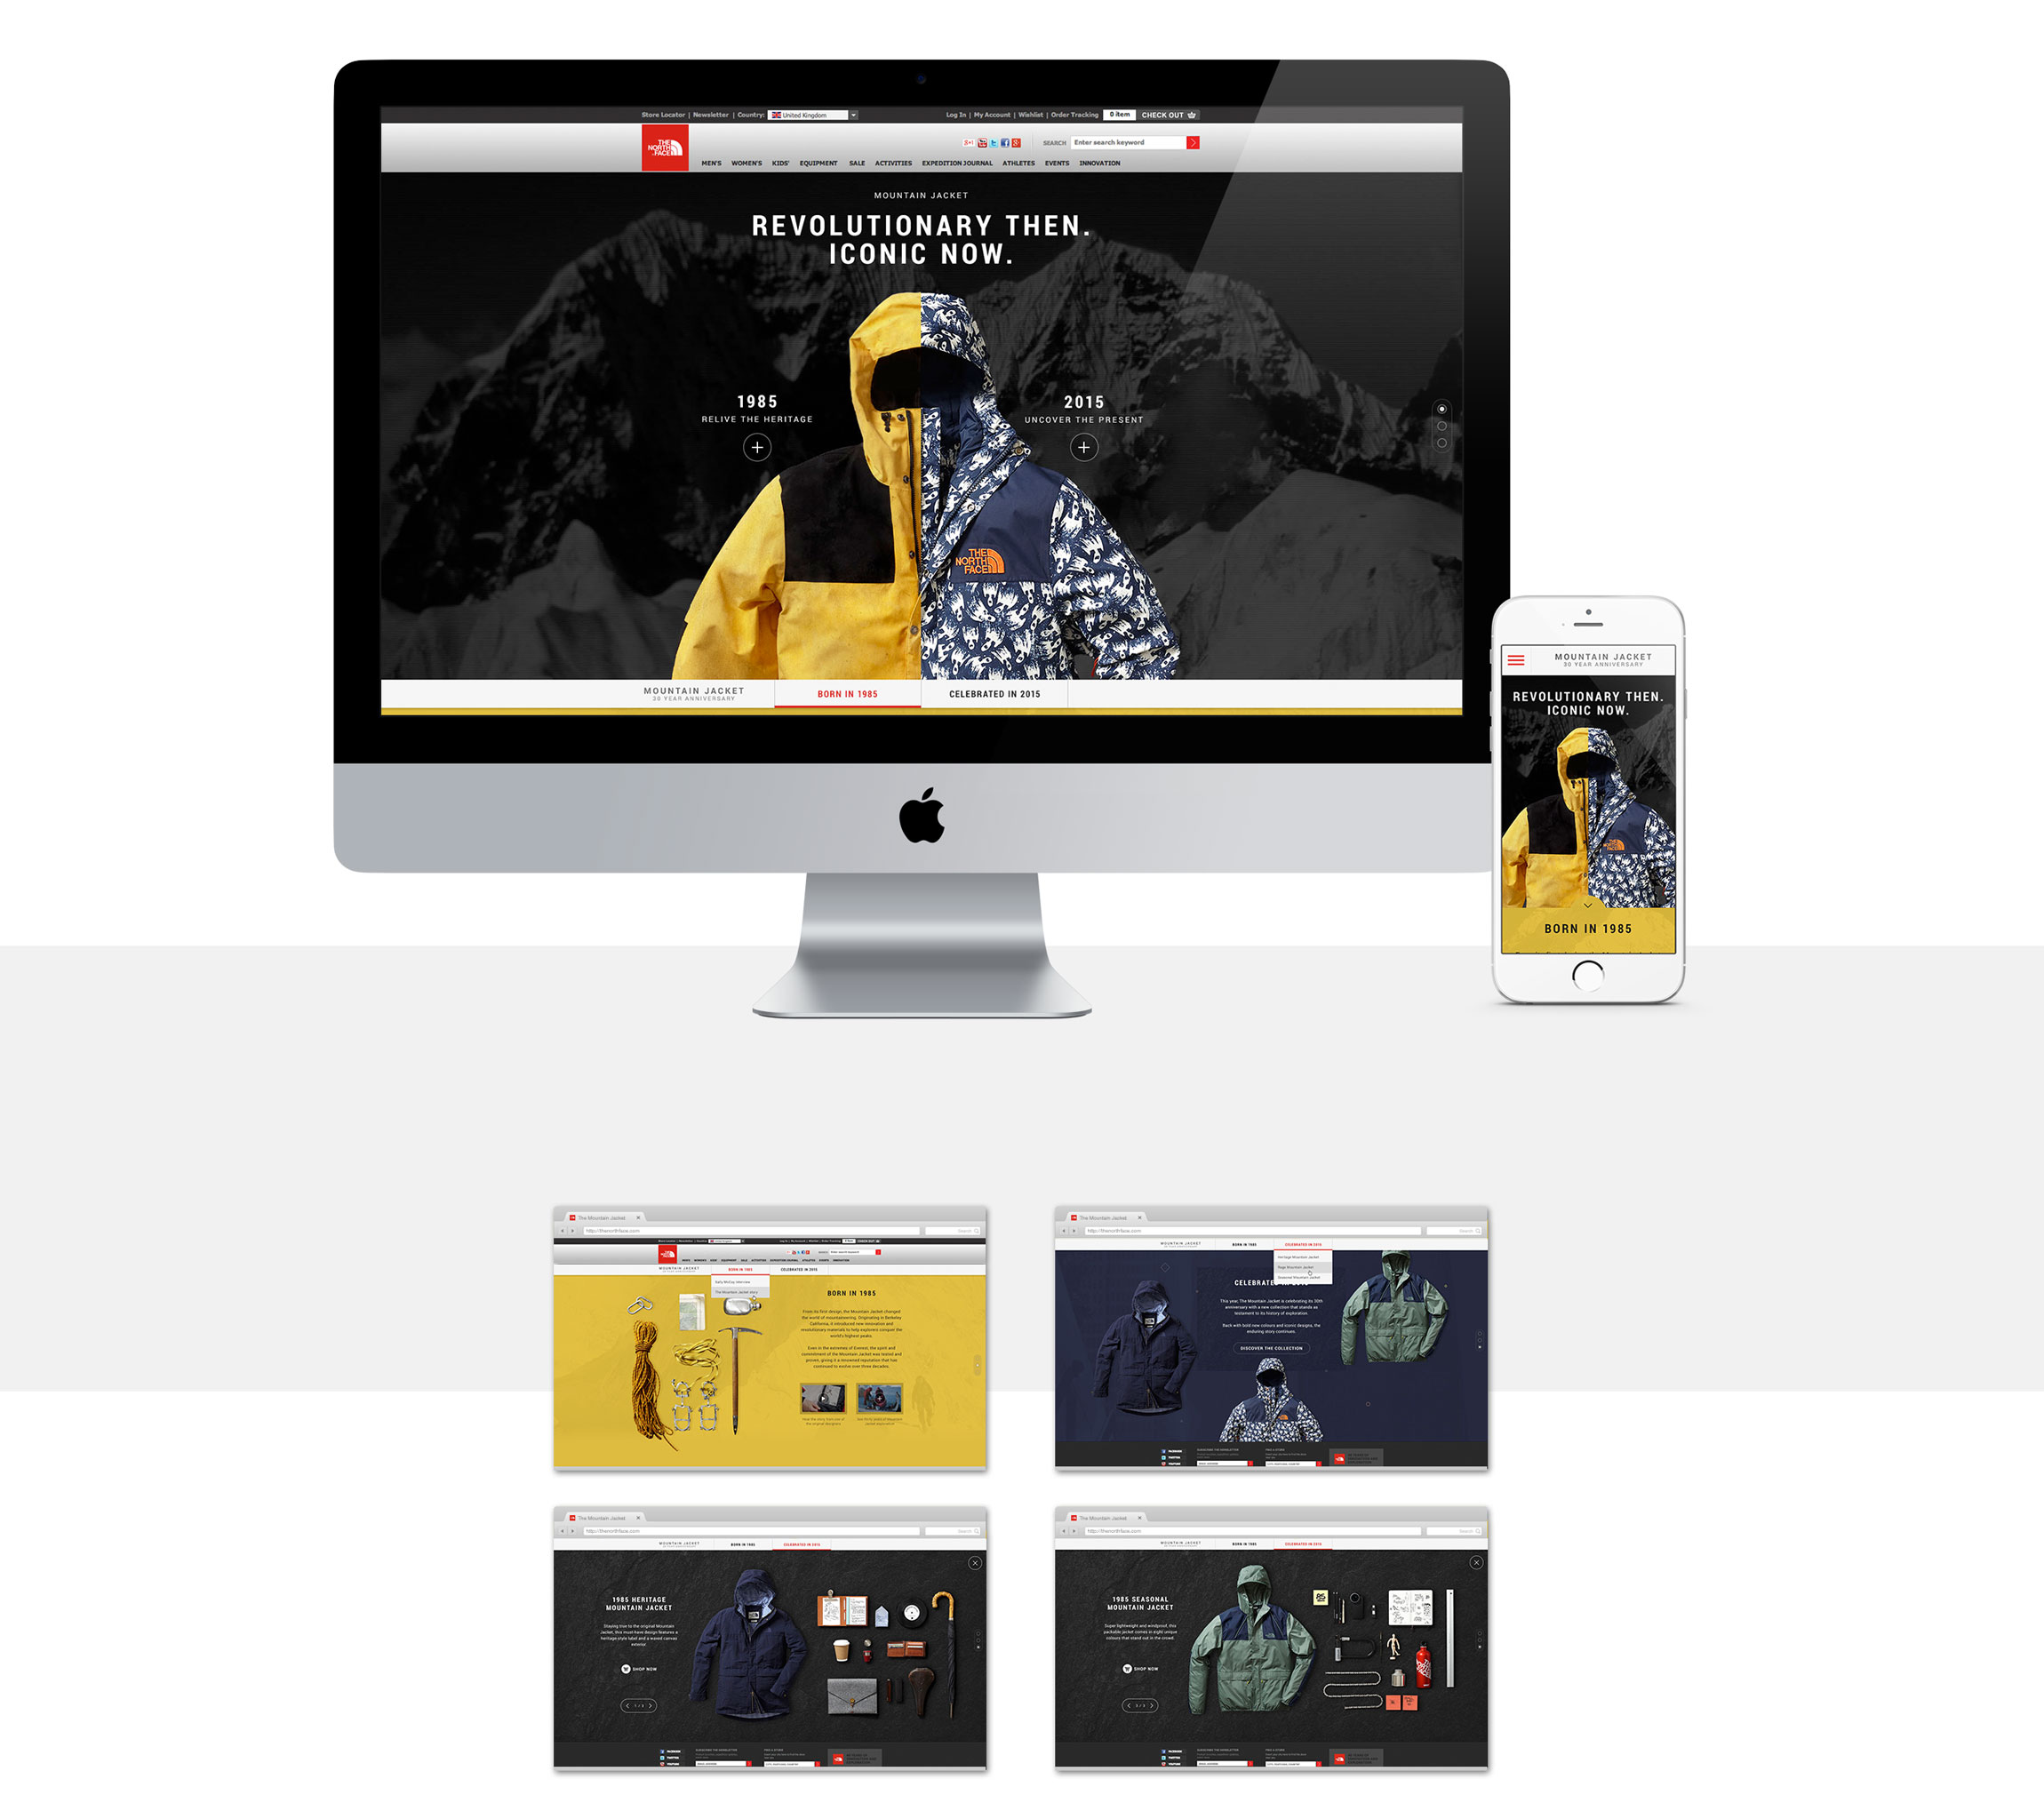 MJ_web